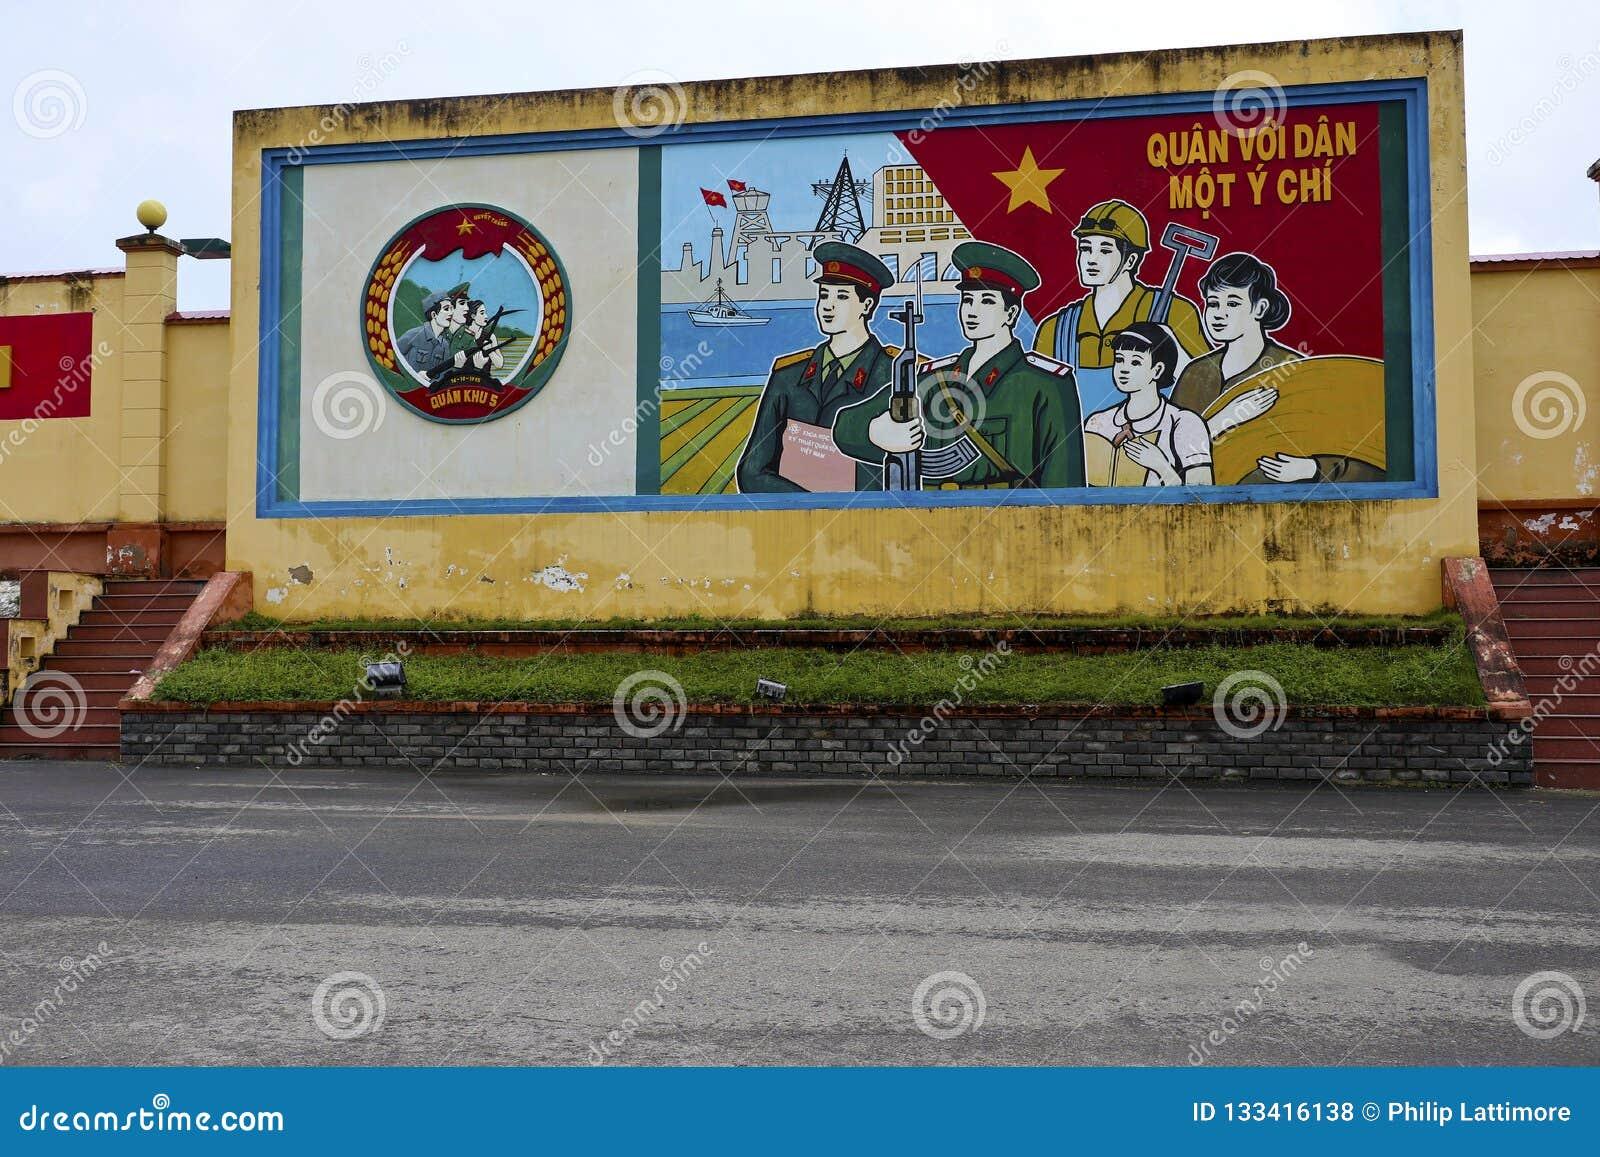 Communist propaganda mural in danang vietnam